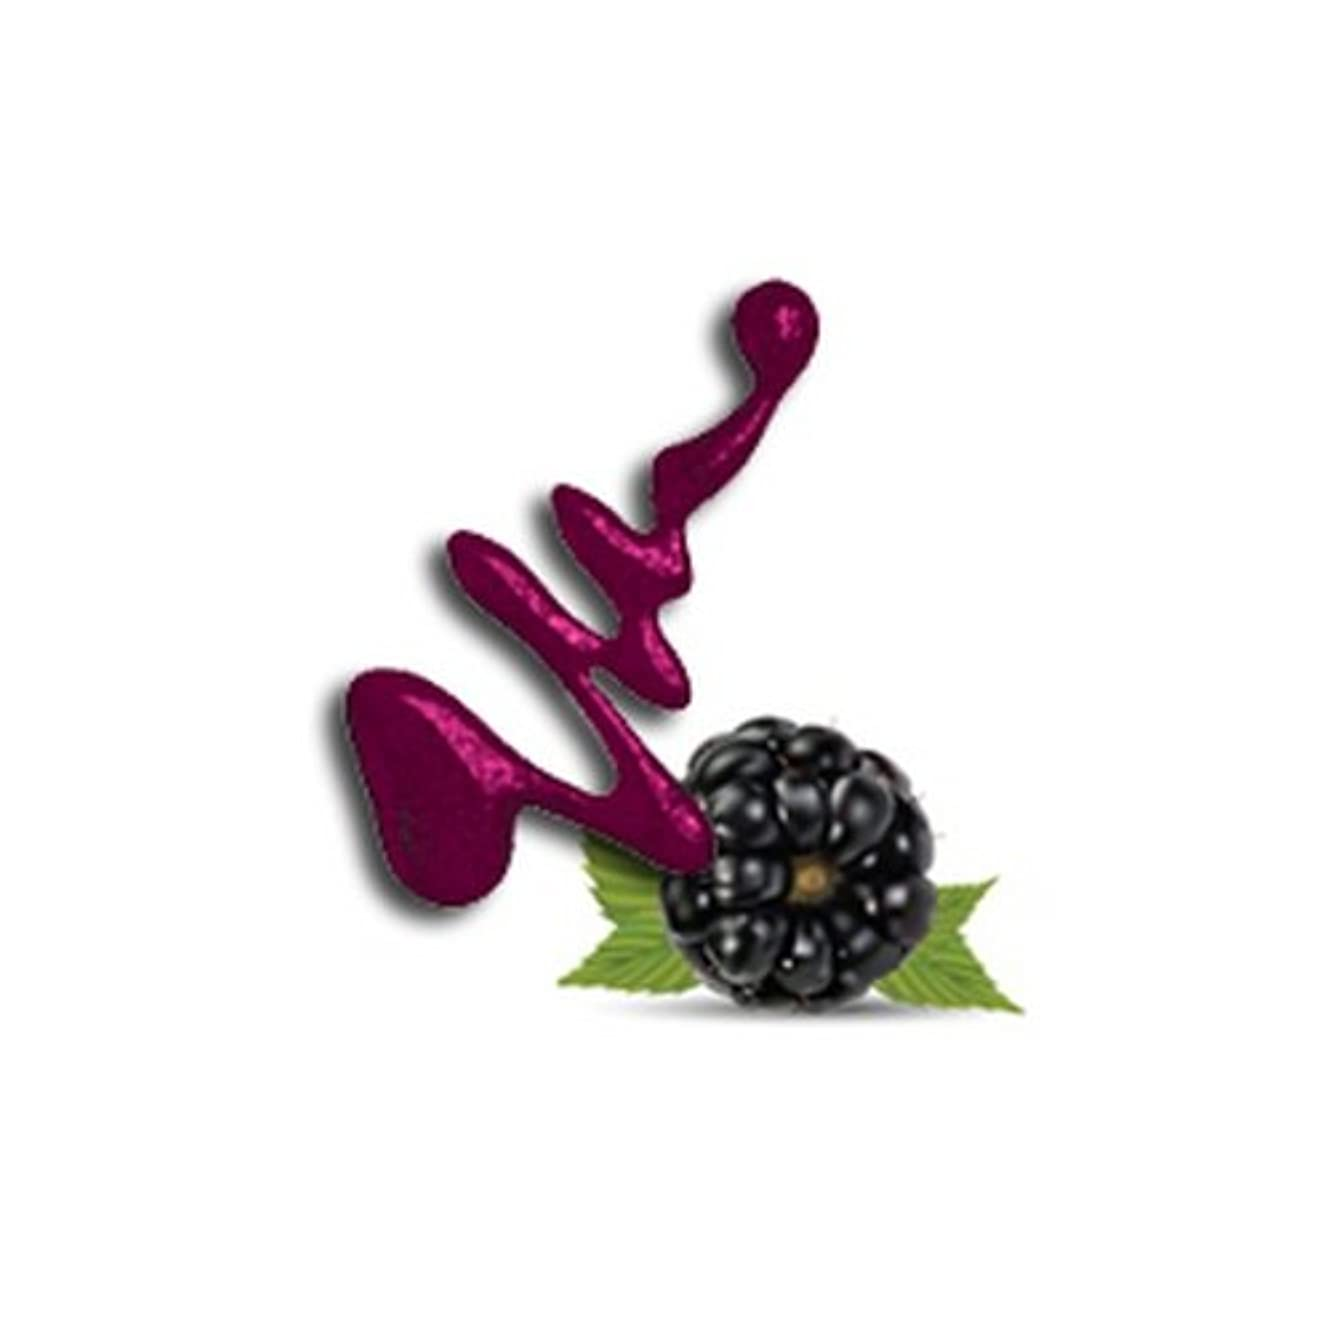 (3 Pack) LA GIRL Fruity Scented Nail Polish - Blissful Blackberry (並行輸入品)